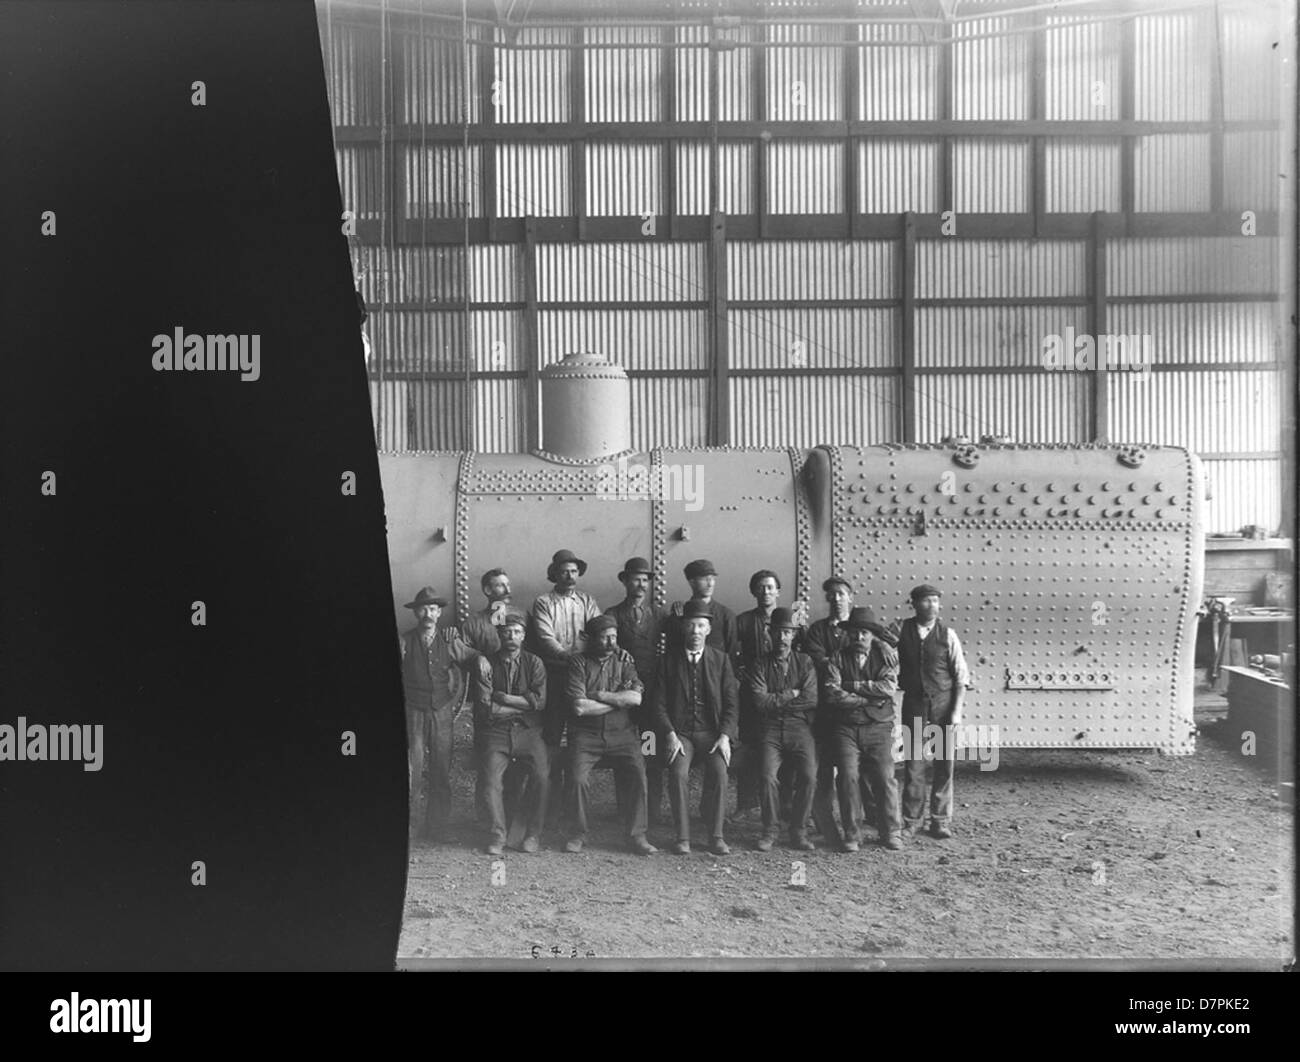 Clyde employees next to railway locomotive boiler - Stock Image